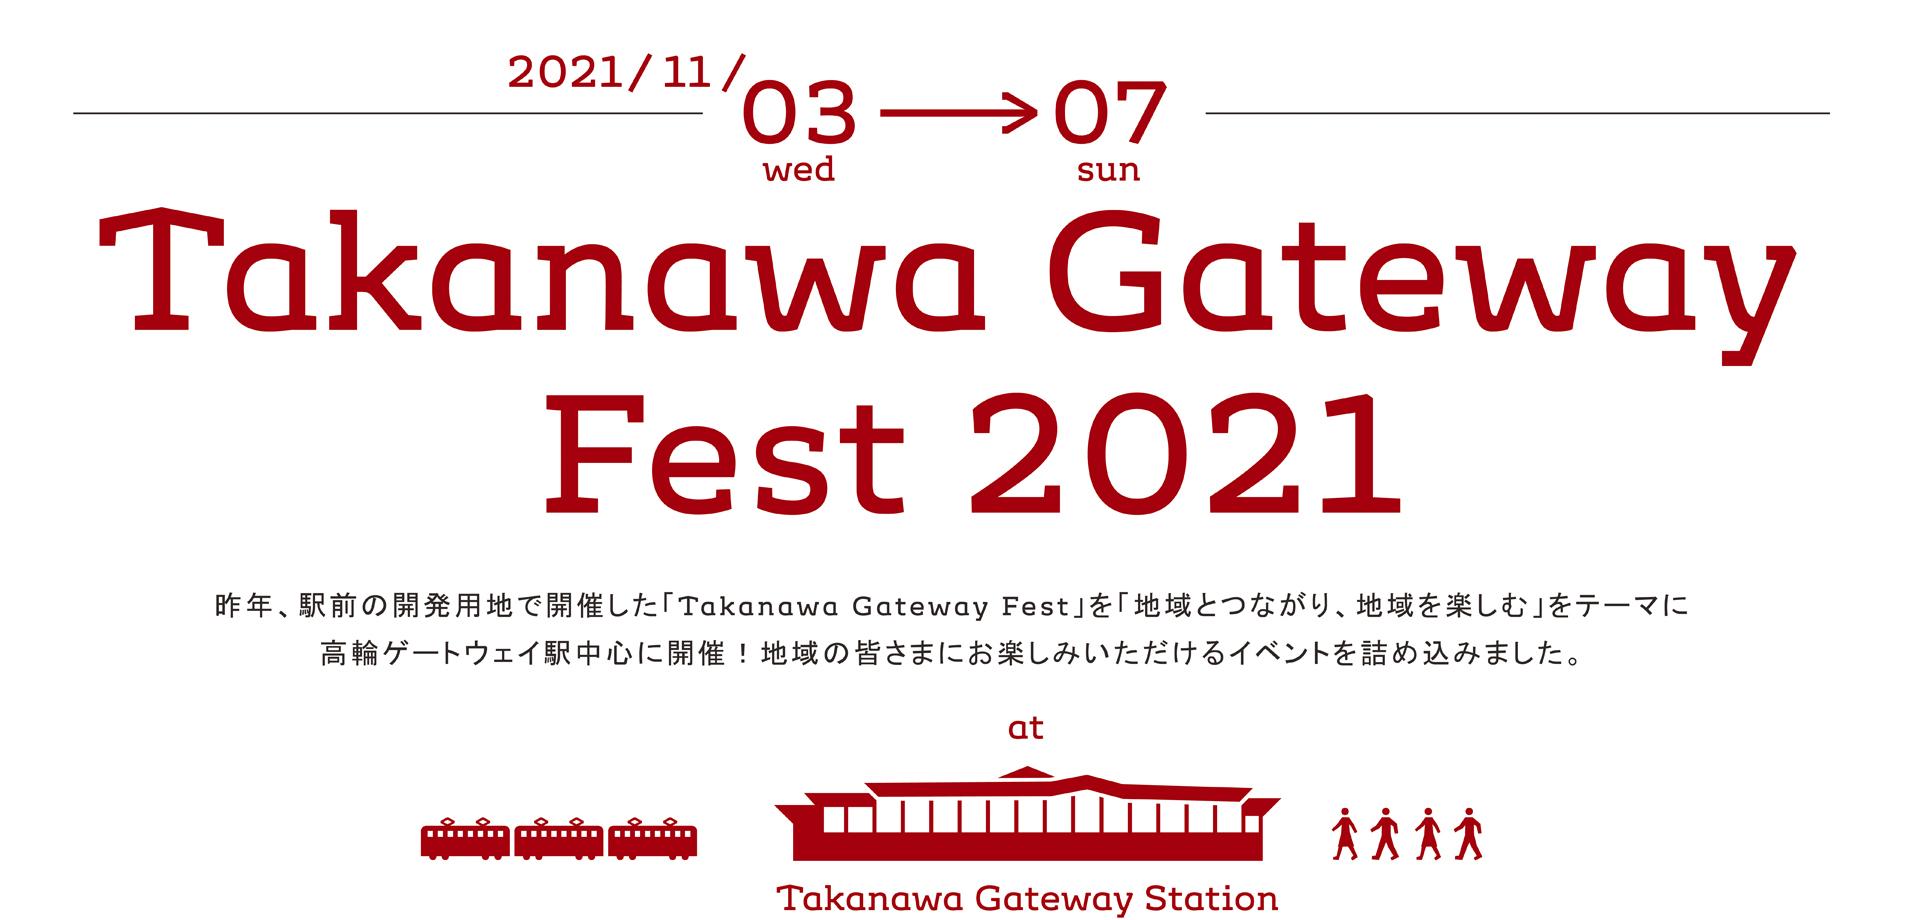 Takanawa Gateway Fest 2021